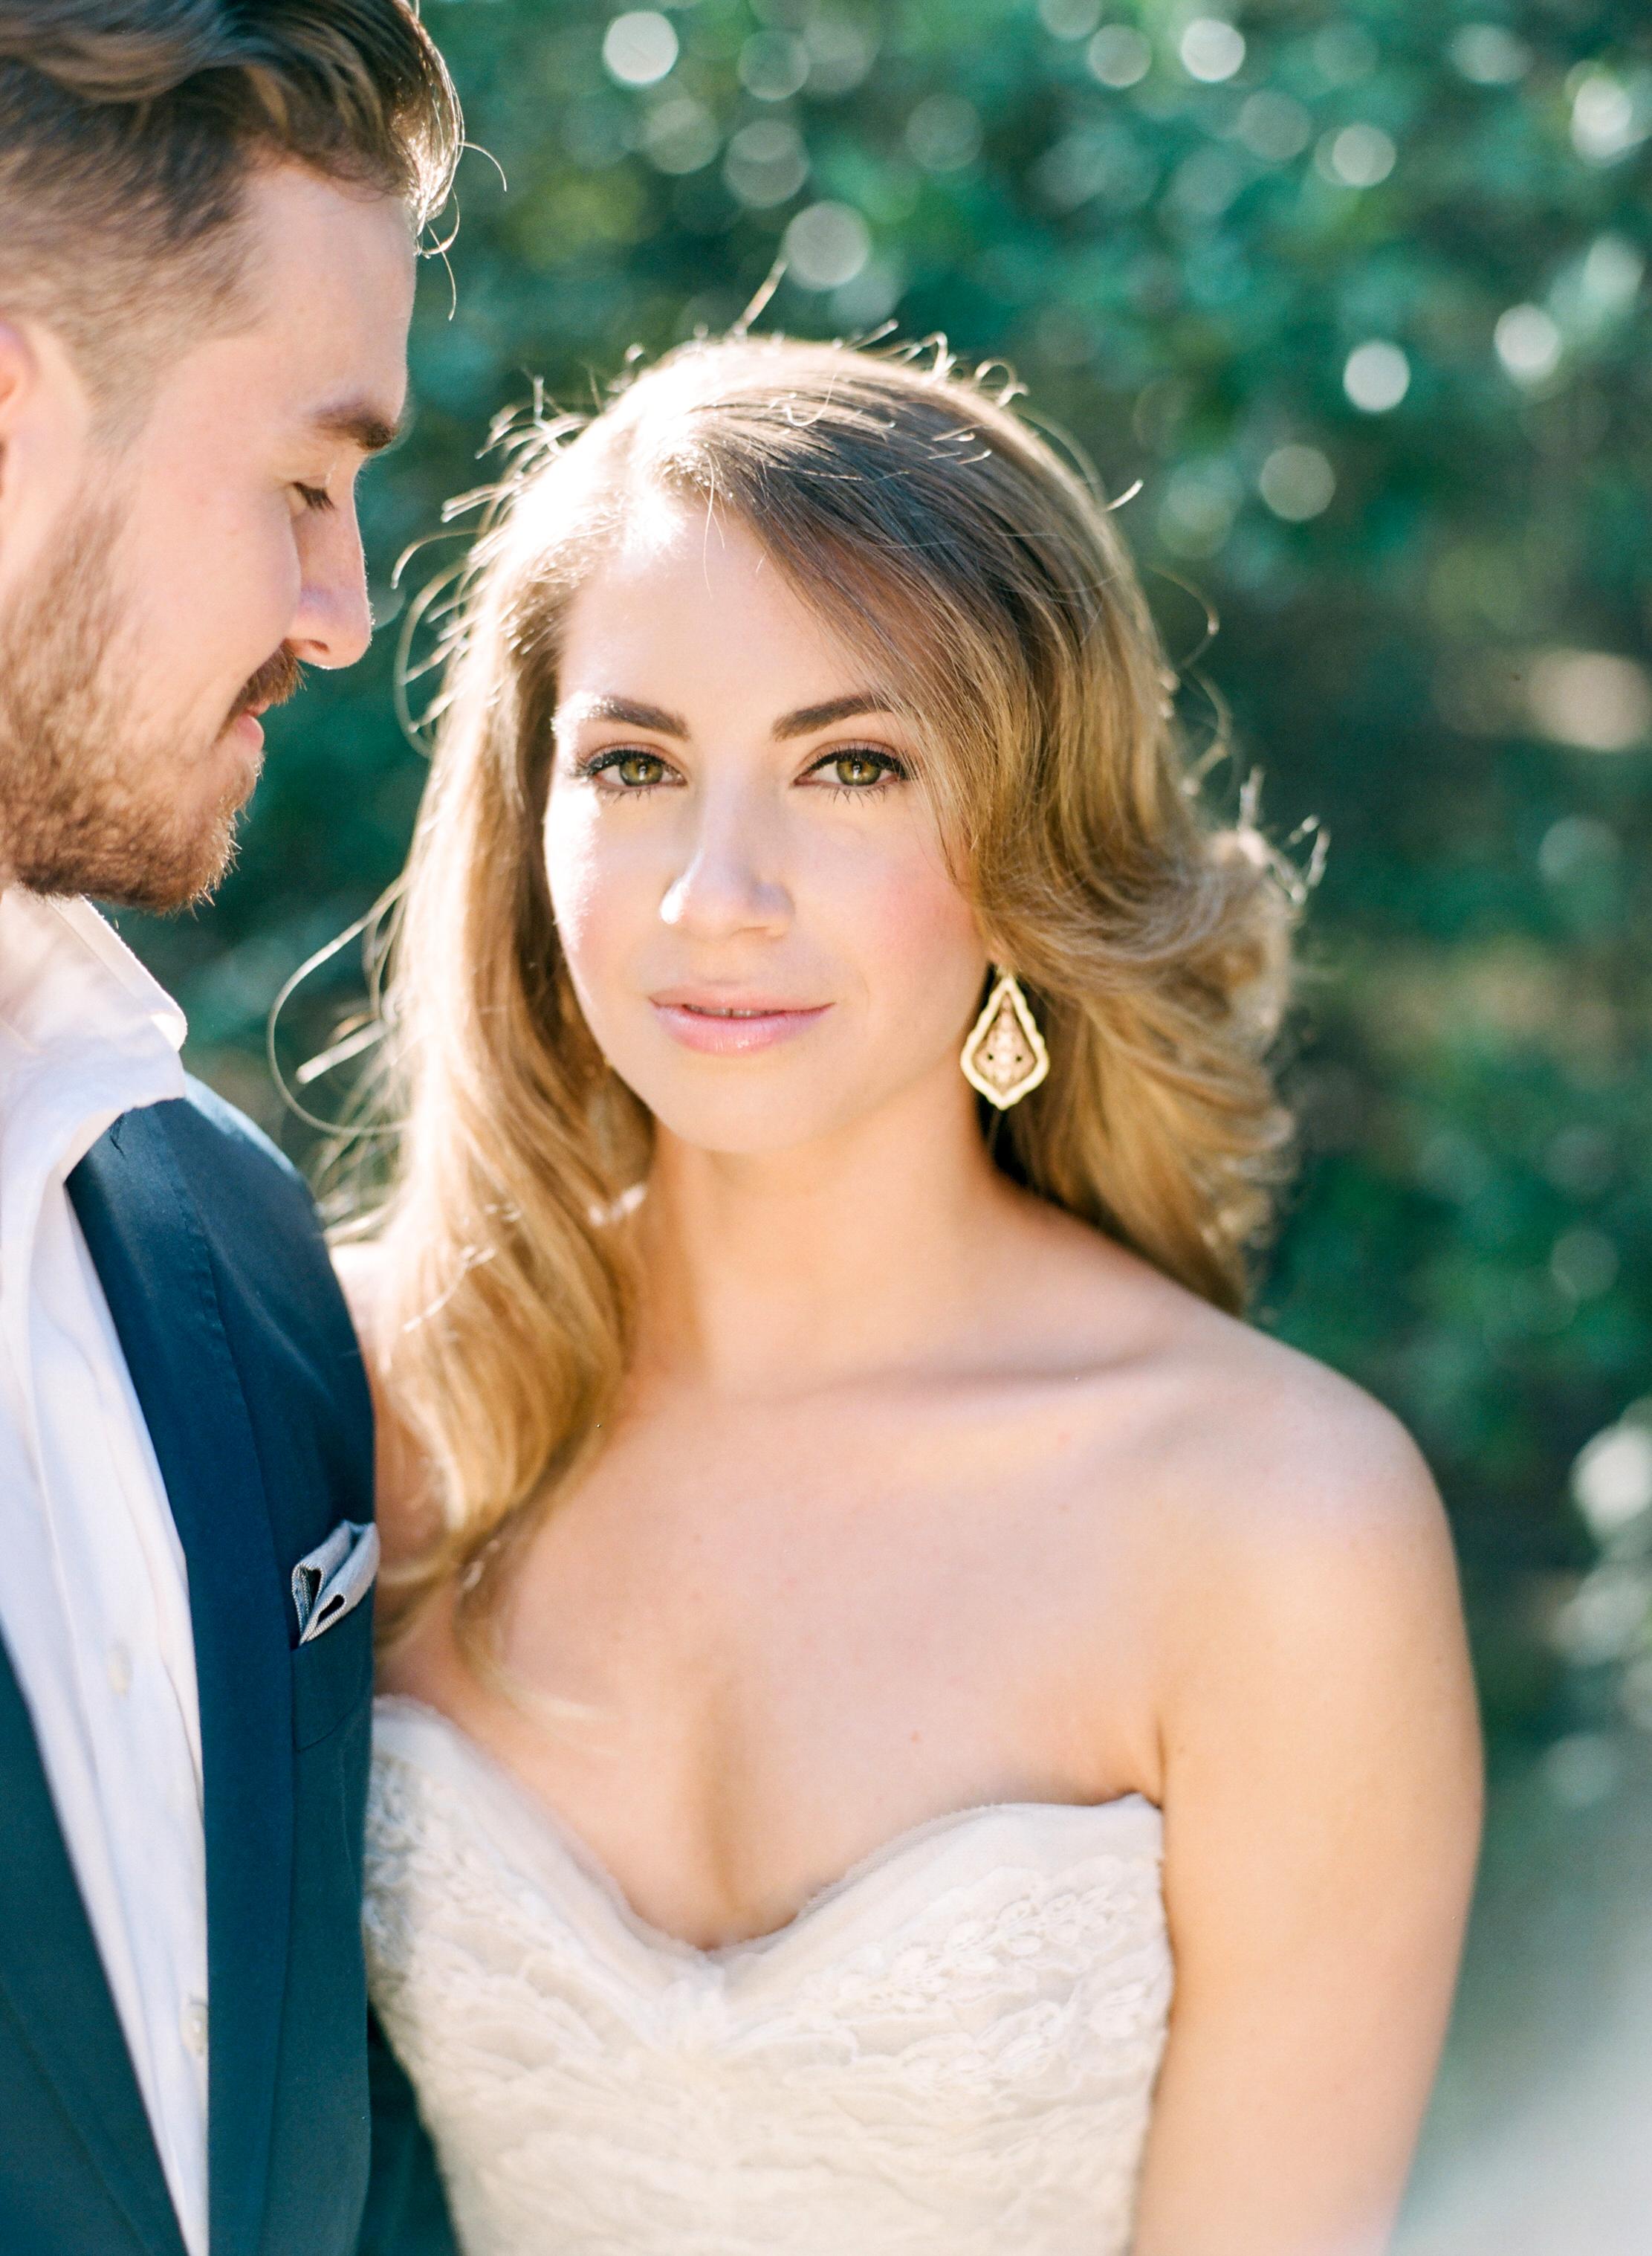 dana-fernandez-photography-the-wedding-chicks-film-houston-wedding-photography-destination-10.jpg